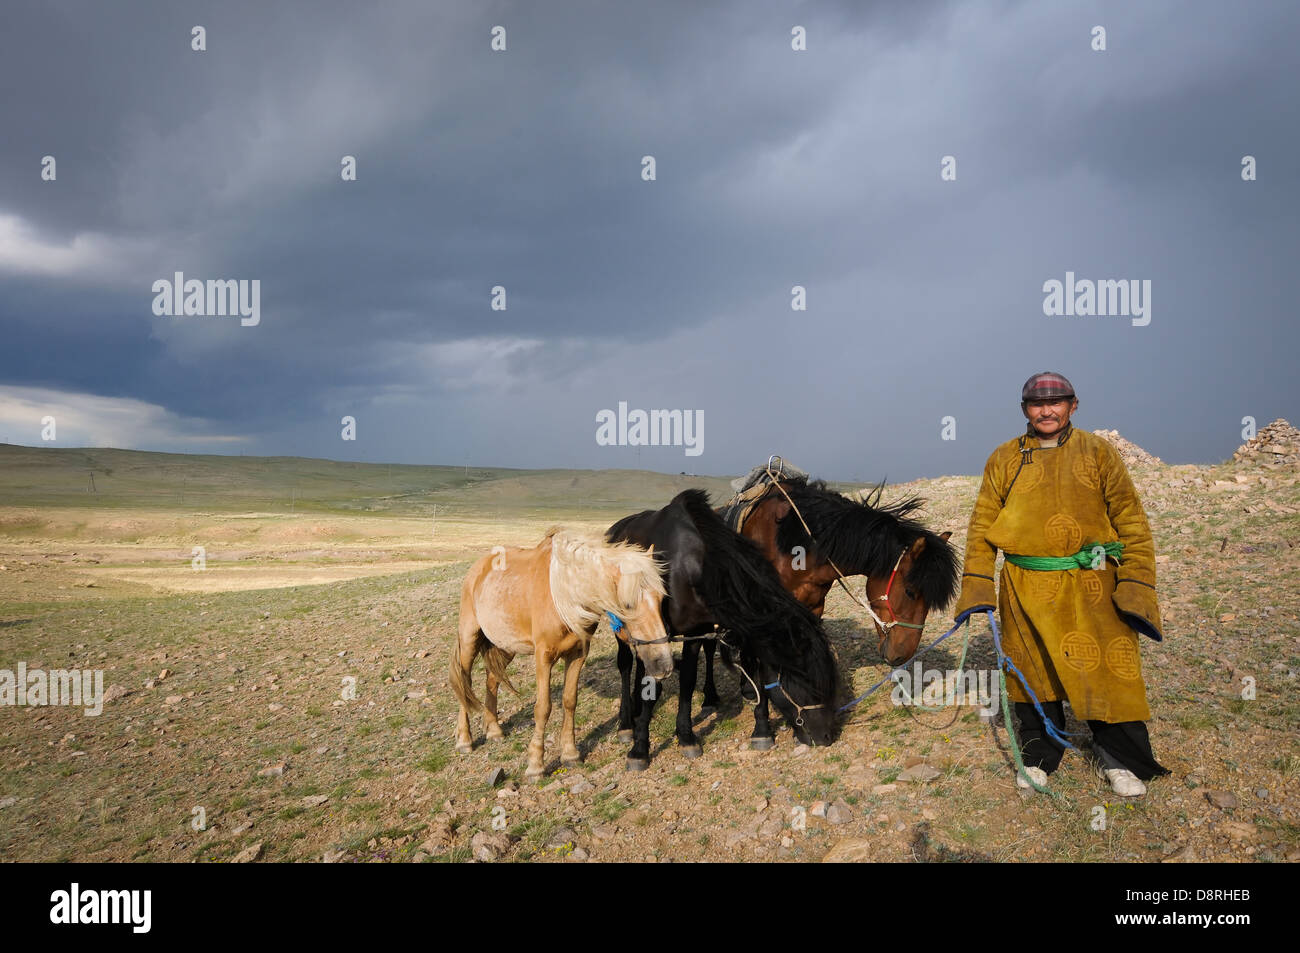 Life in ruralMongolia. - Stock Image